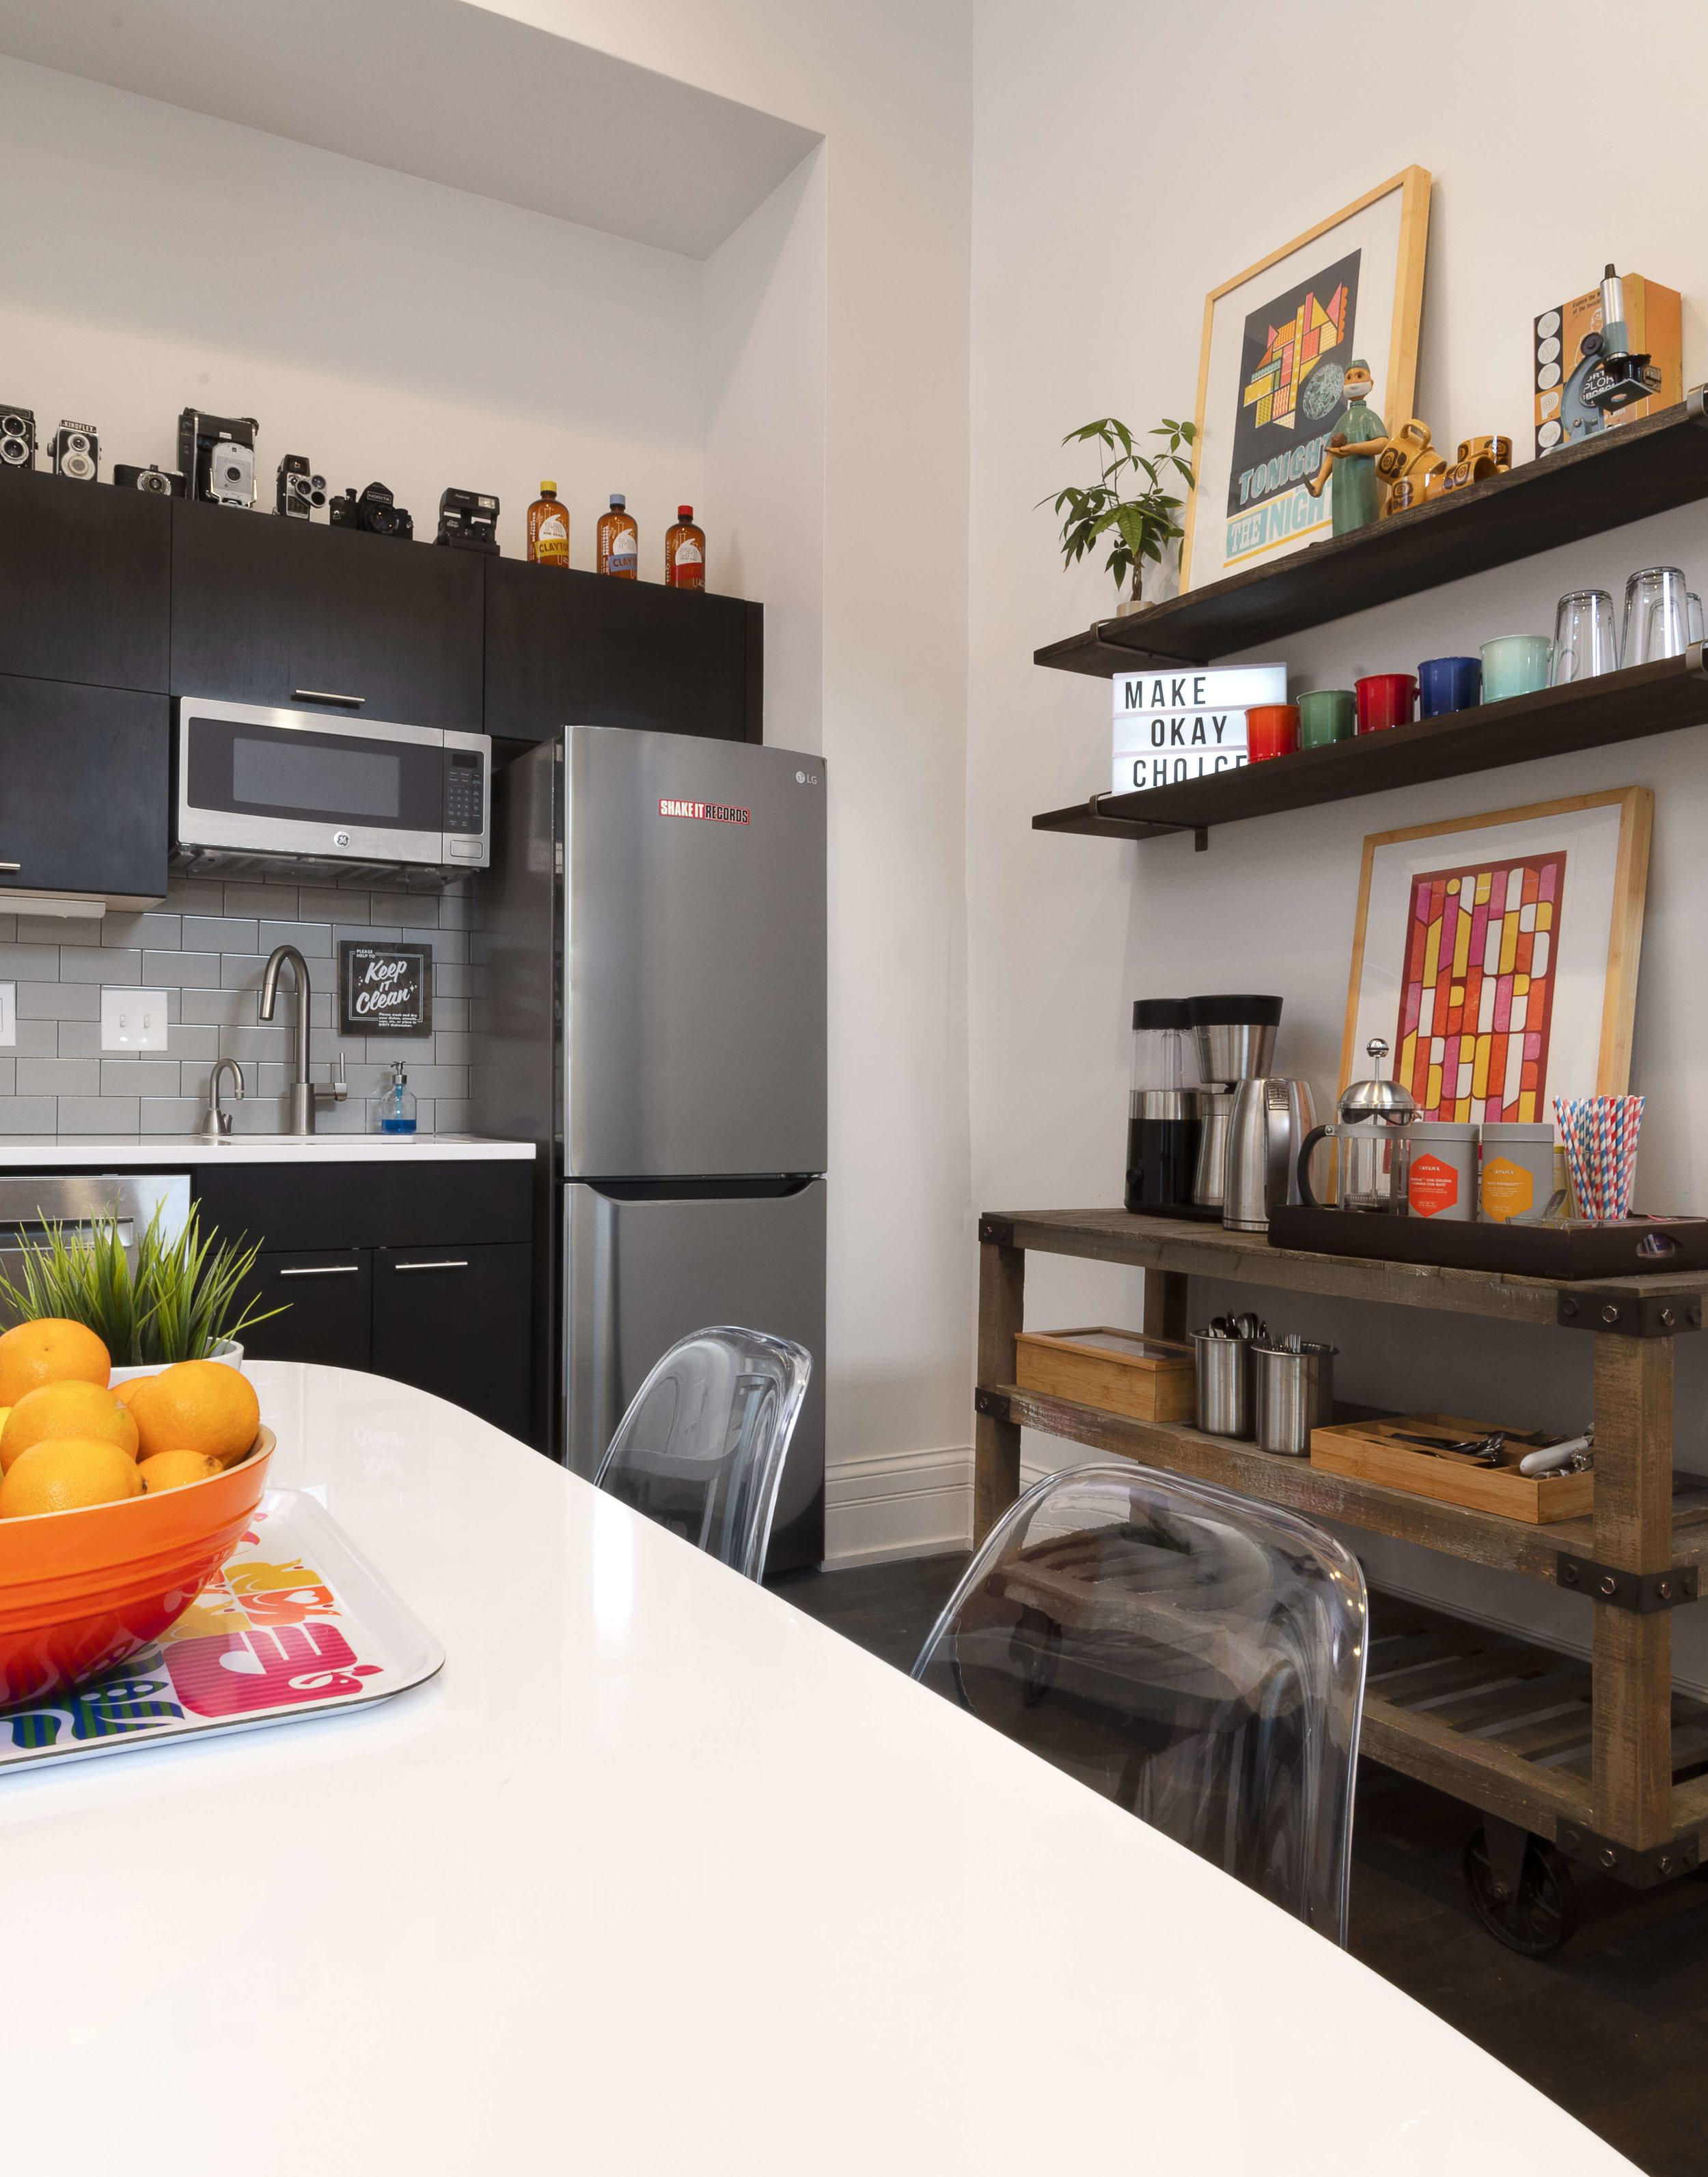 northside-depot-co-working-kitchen.jpg